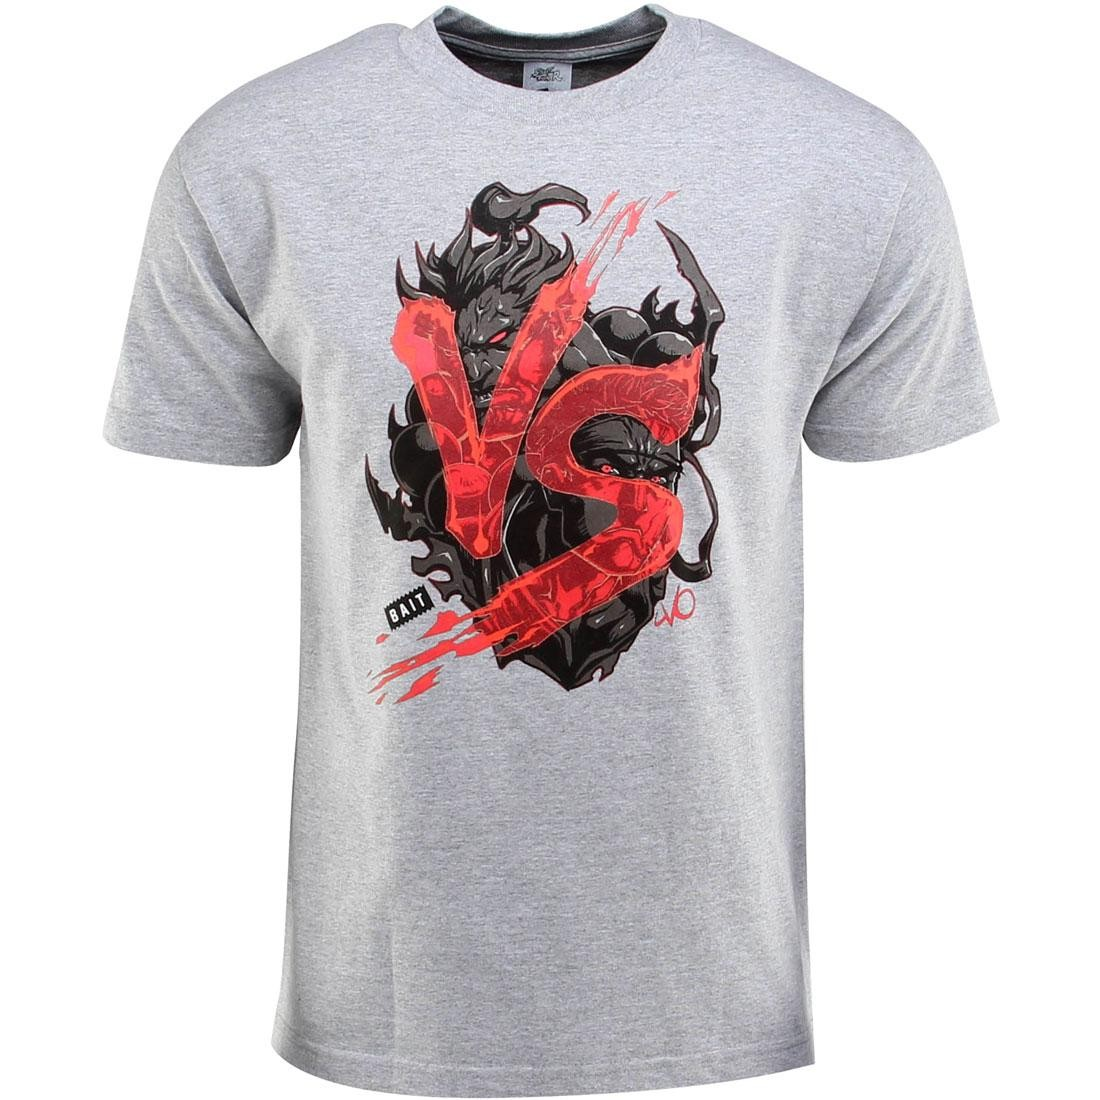 Bait X Street Fighter Akuma Vs Ryu Tee Long Vo Gray Heather Gray Black